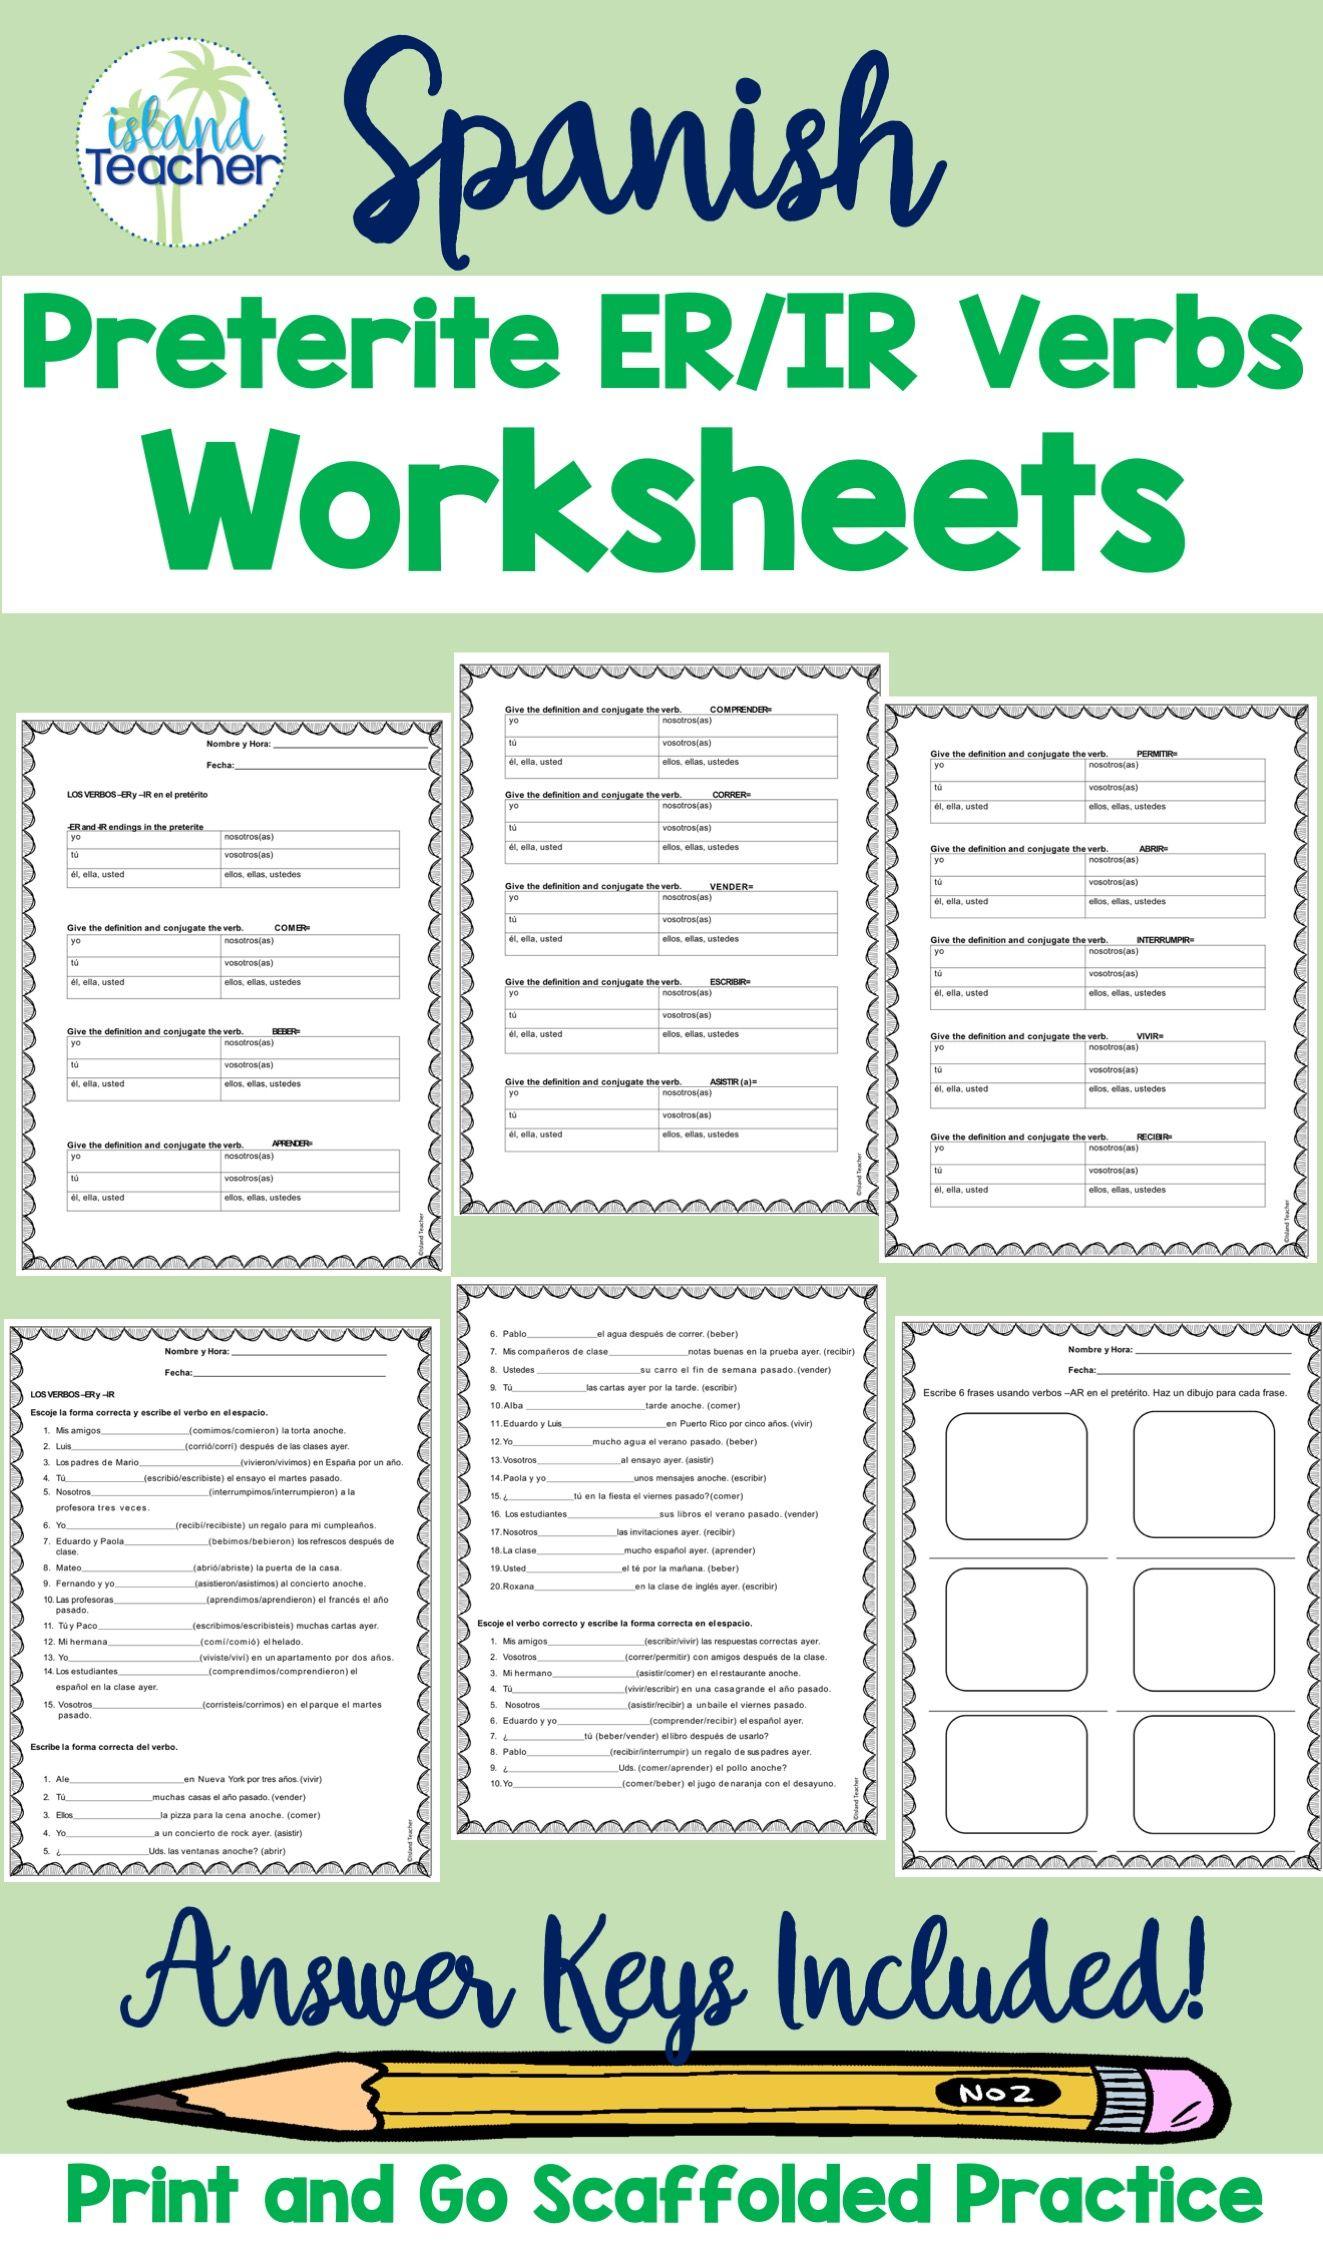 Spanish Preterite Er Ir Verbs Worksheets Verb Practice Verb Worksheets Preterite Spanish [ 2249 x 1323 Pixel ]